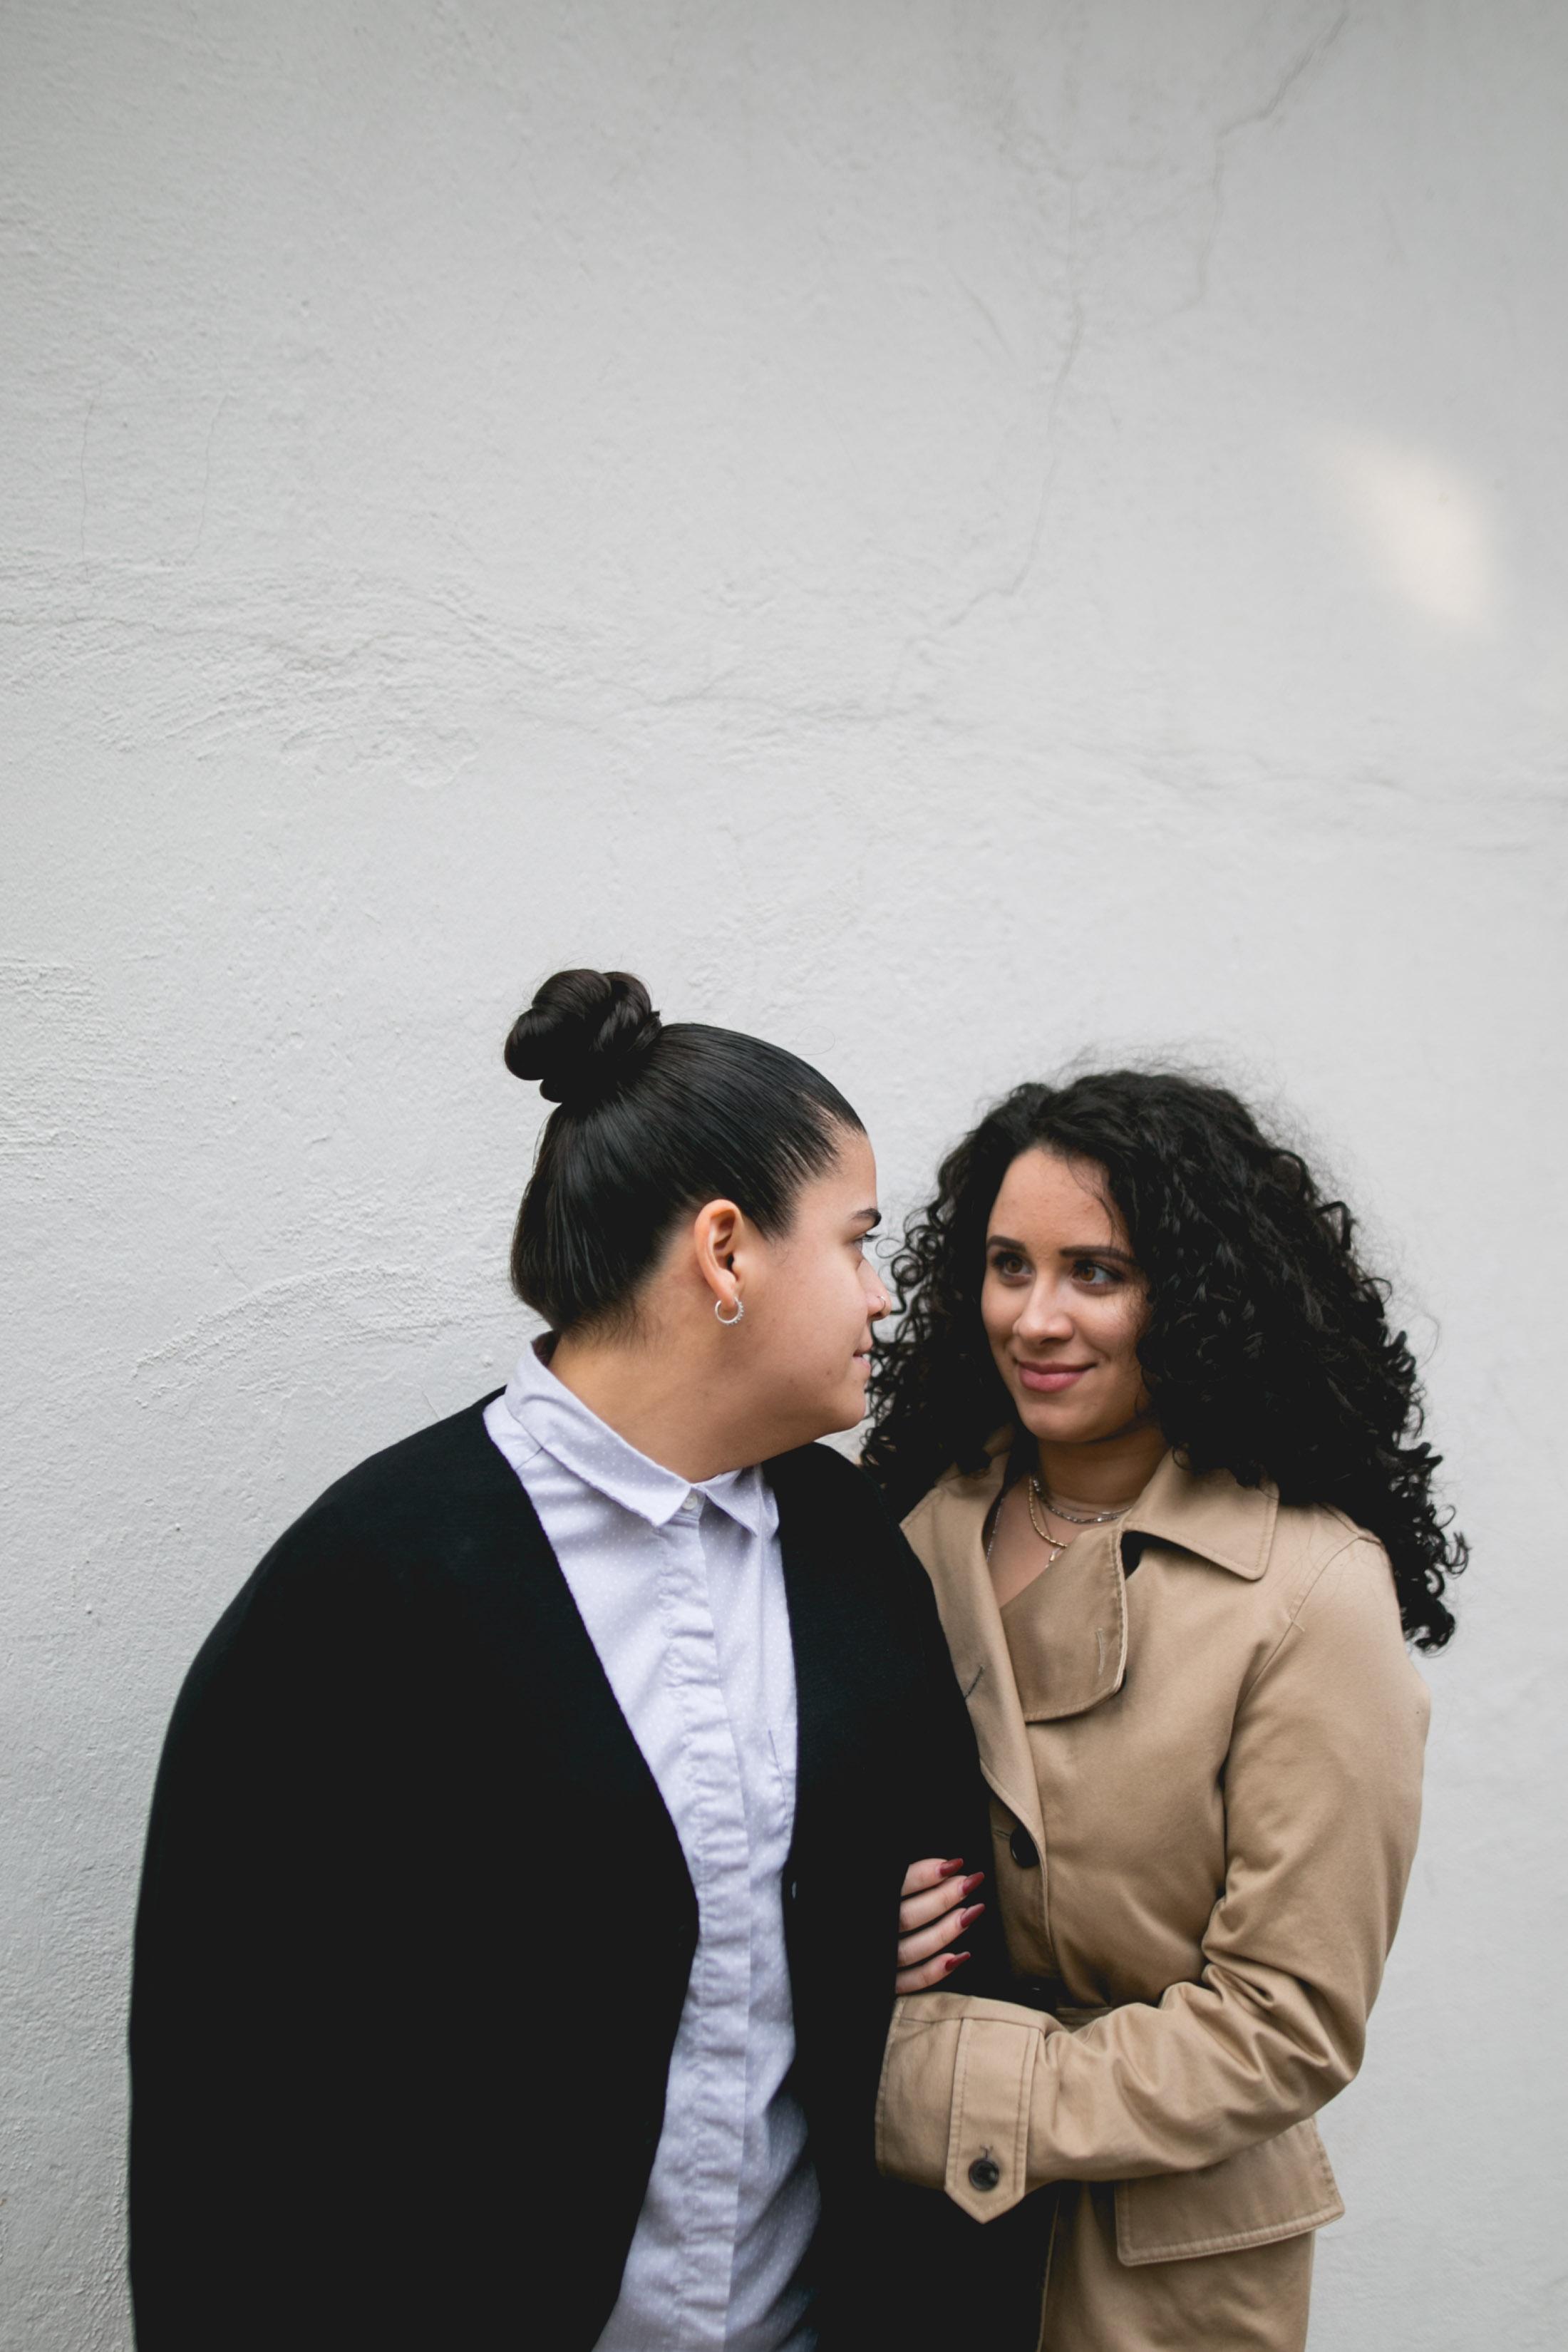 Center City Philadelphia Engagement Session for LGBTQ Couple